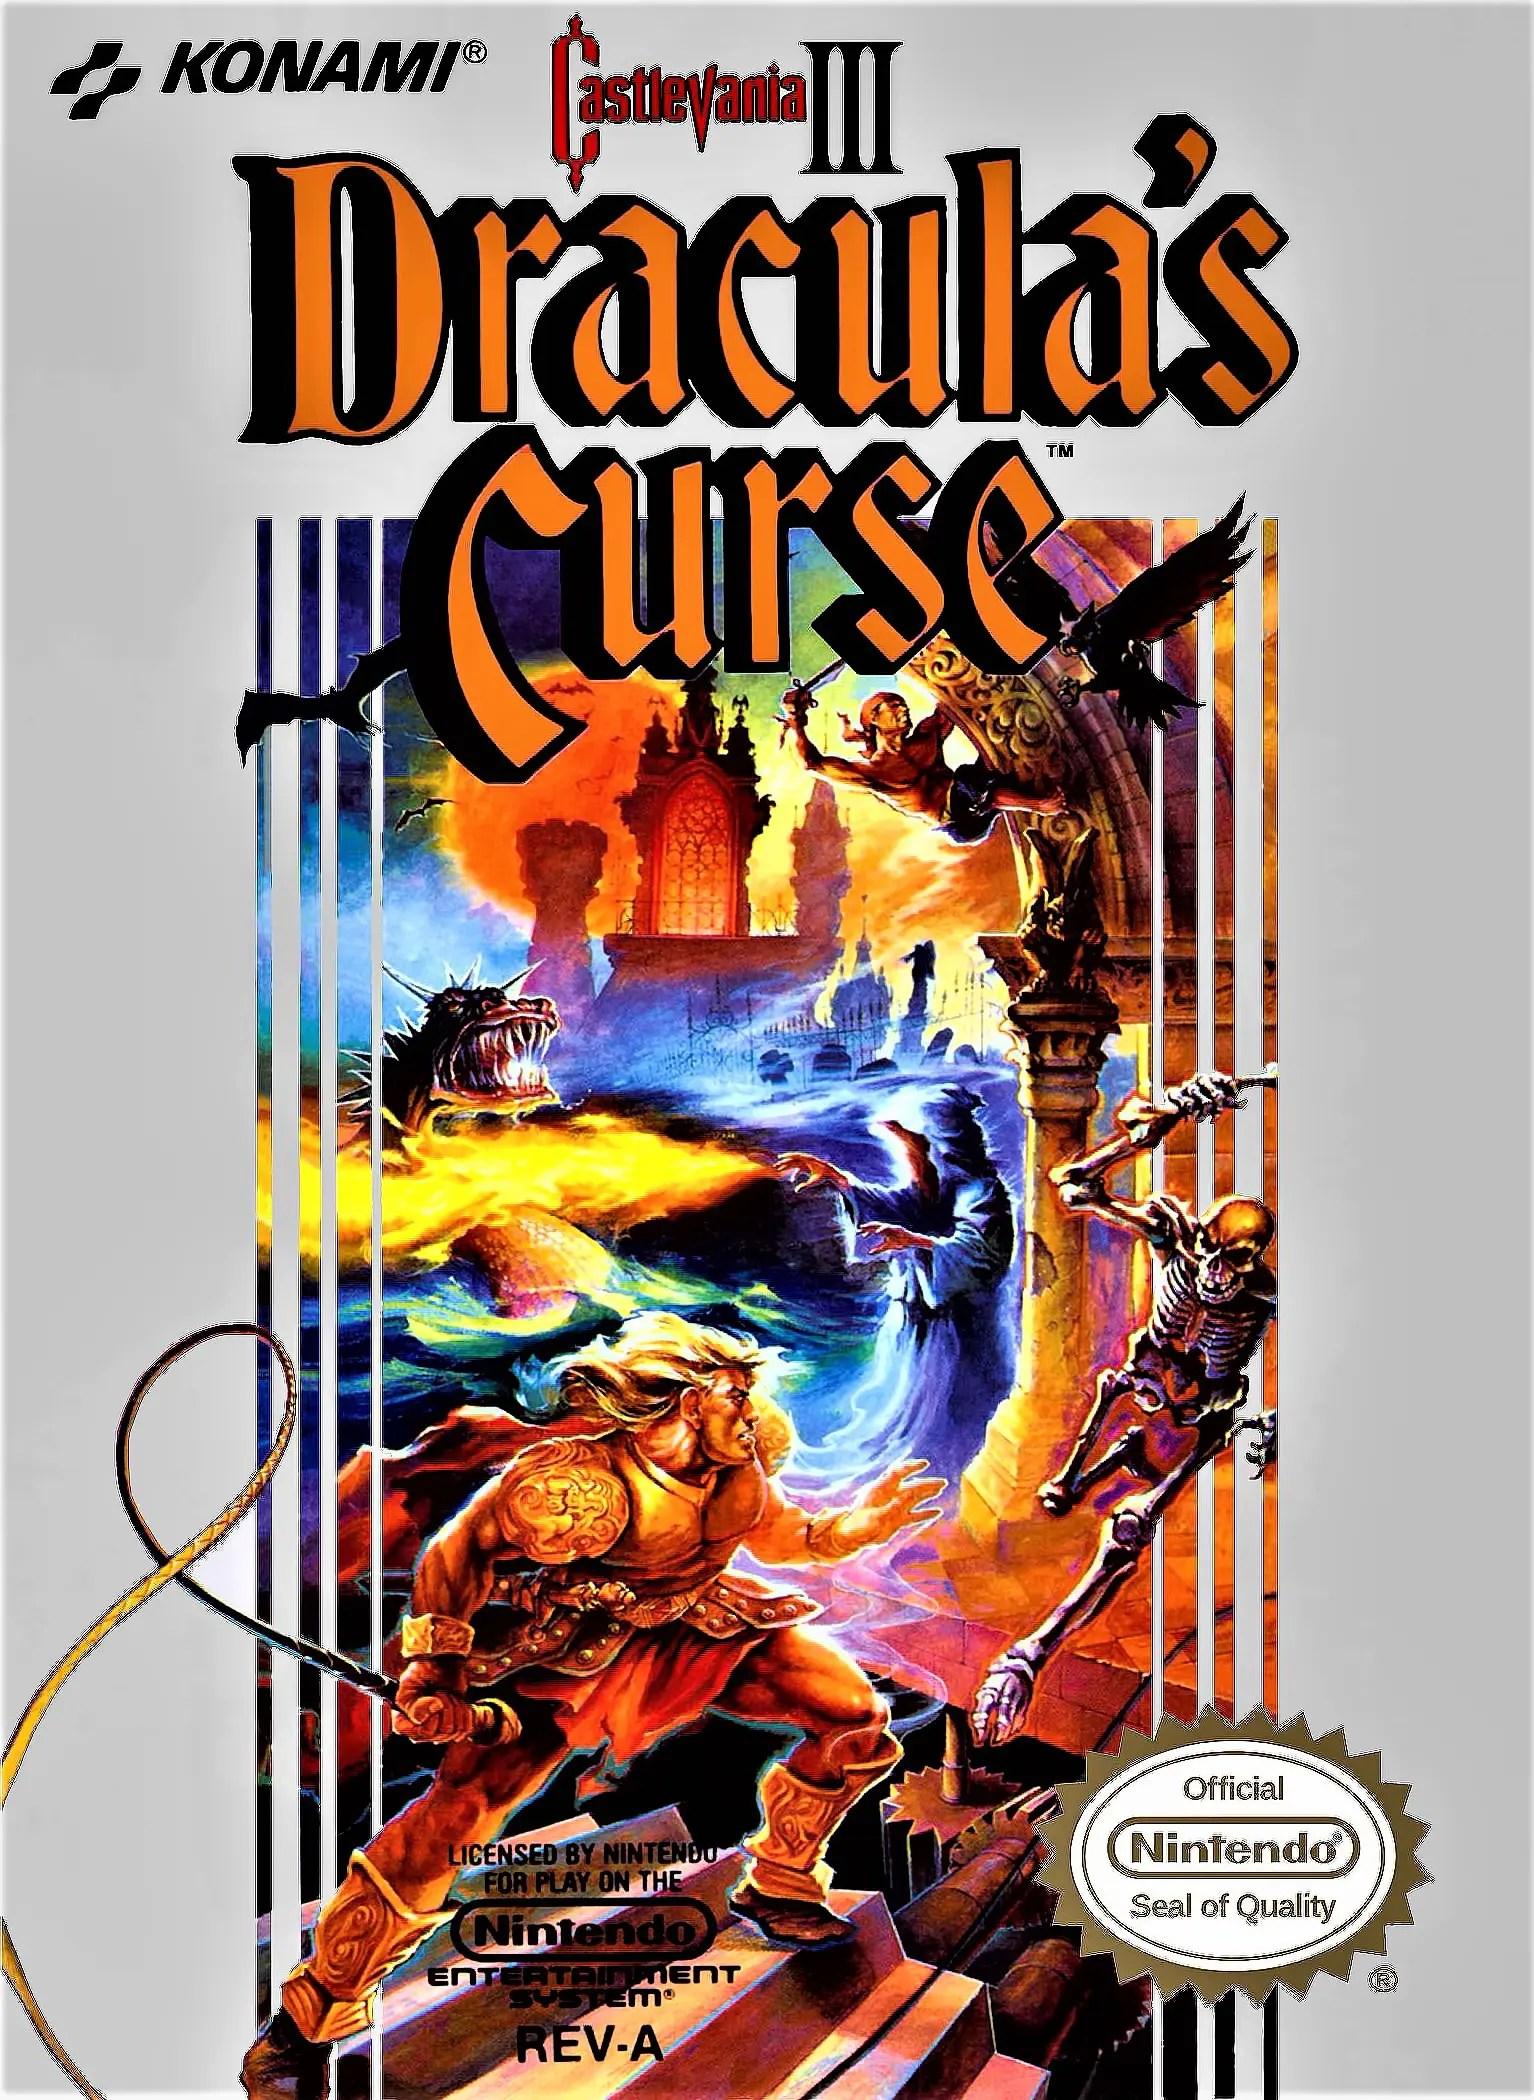 Castlevania III: Dracula's Curse for Nintendo Entertainment System (NES)